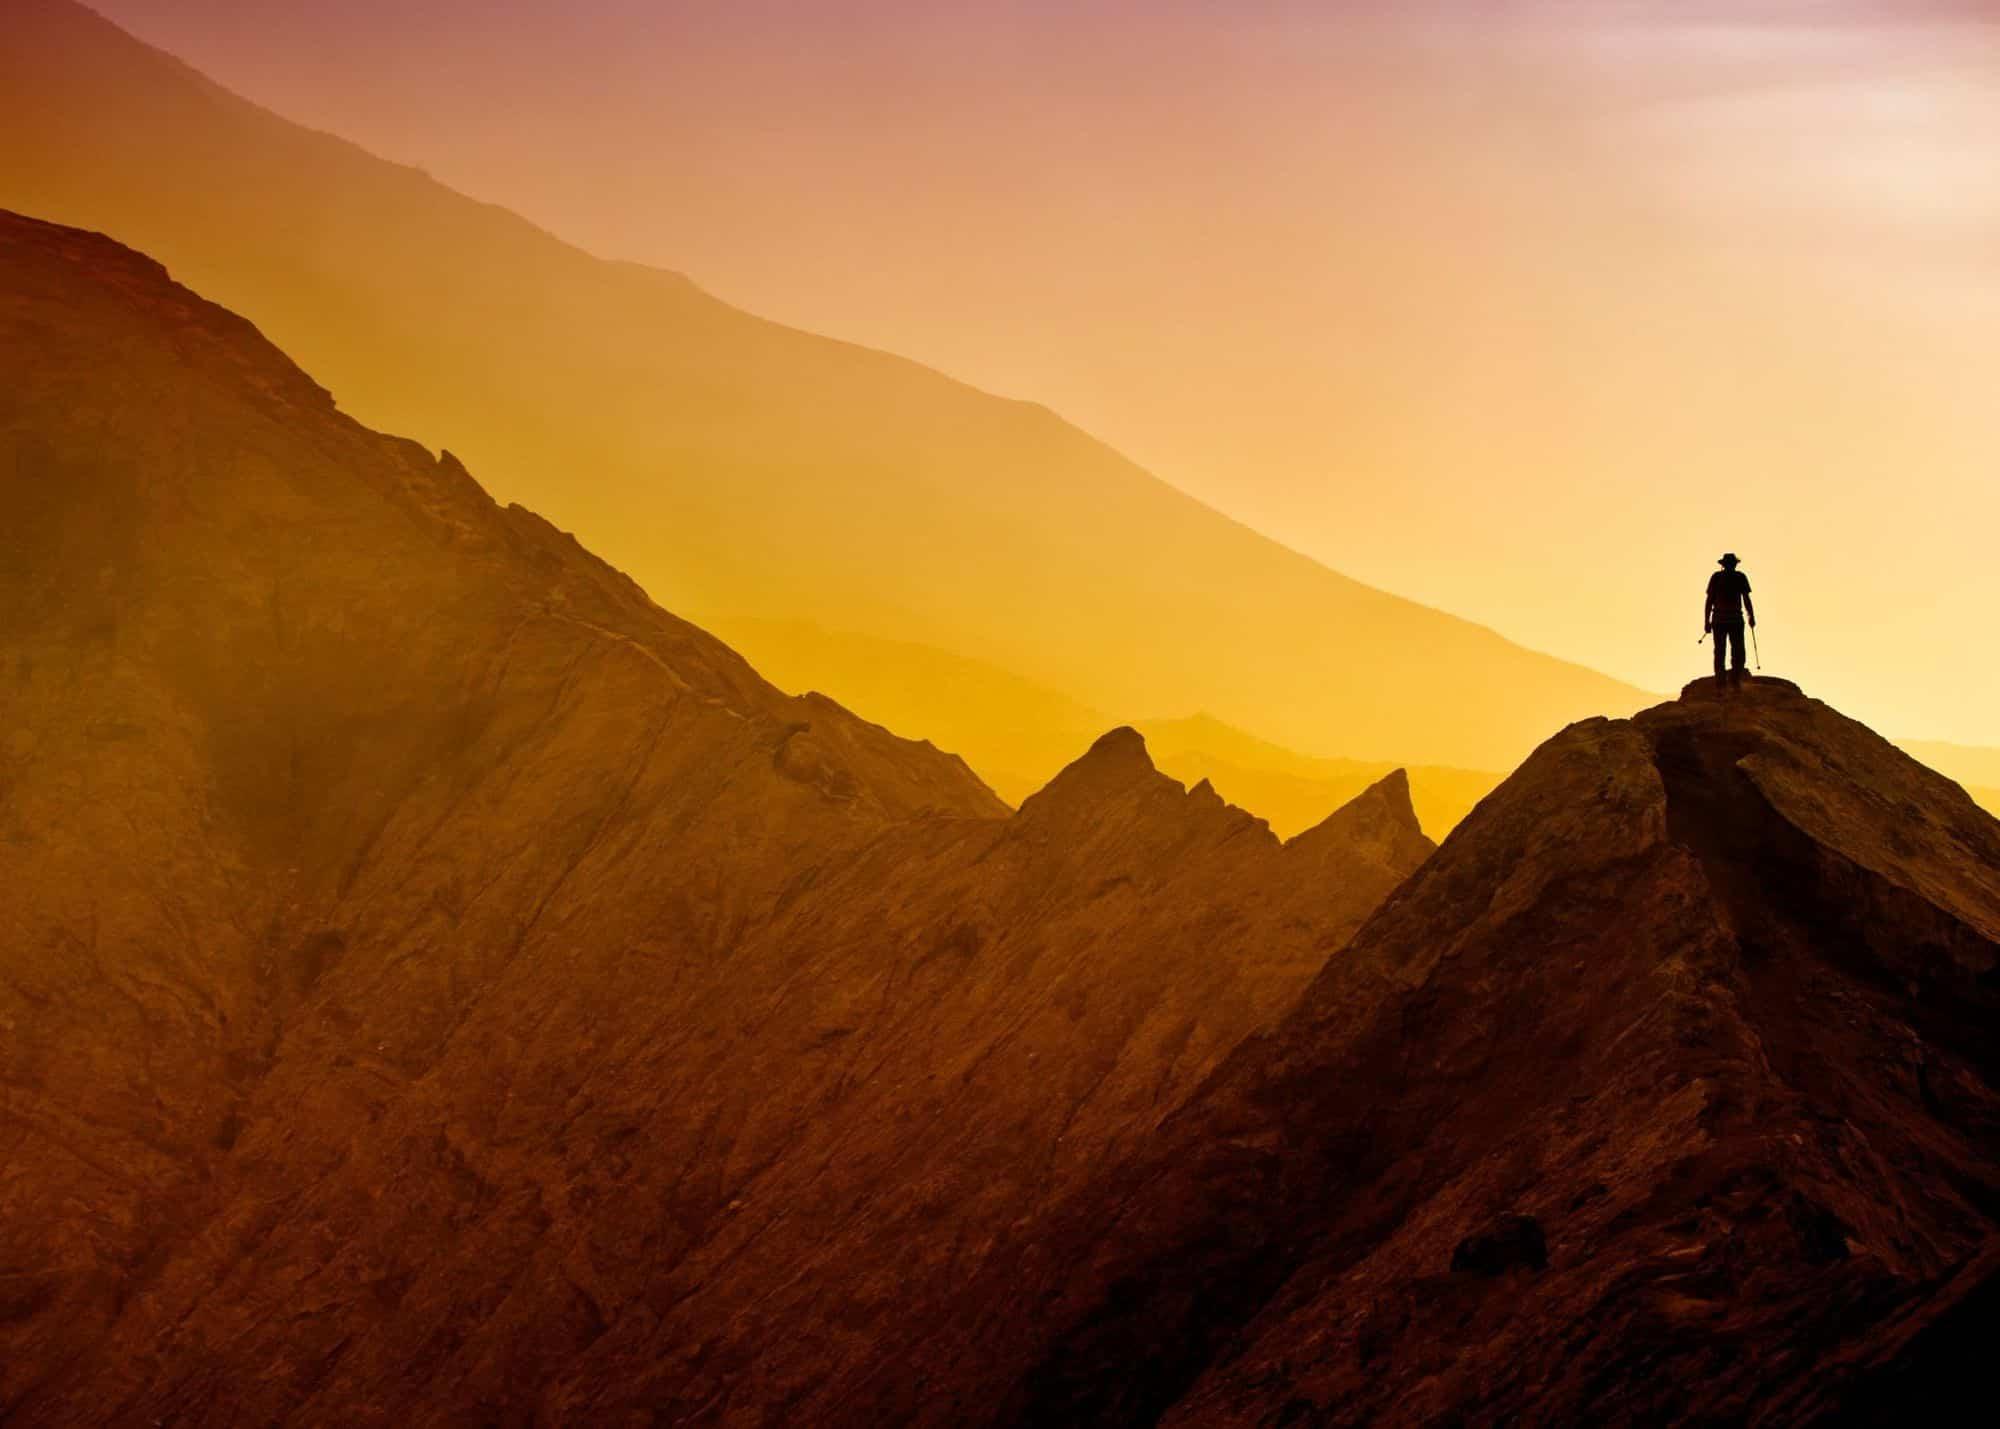 Mountain range hiking in summer orange silhouette